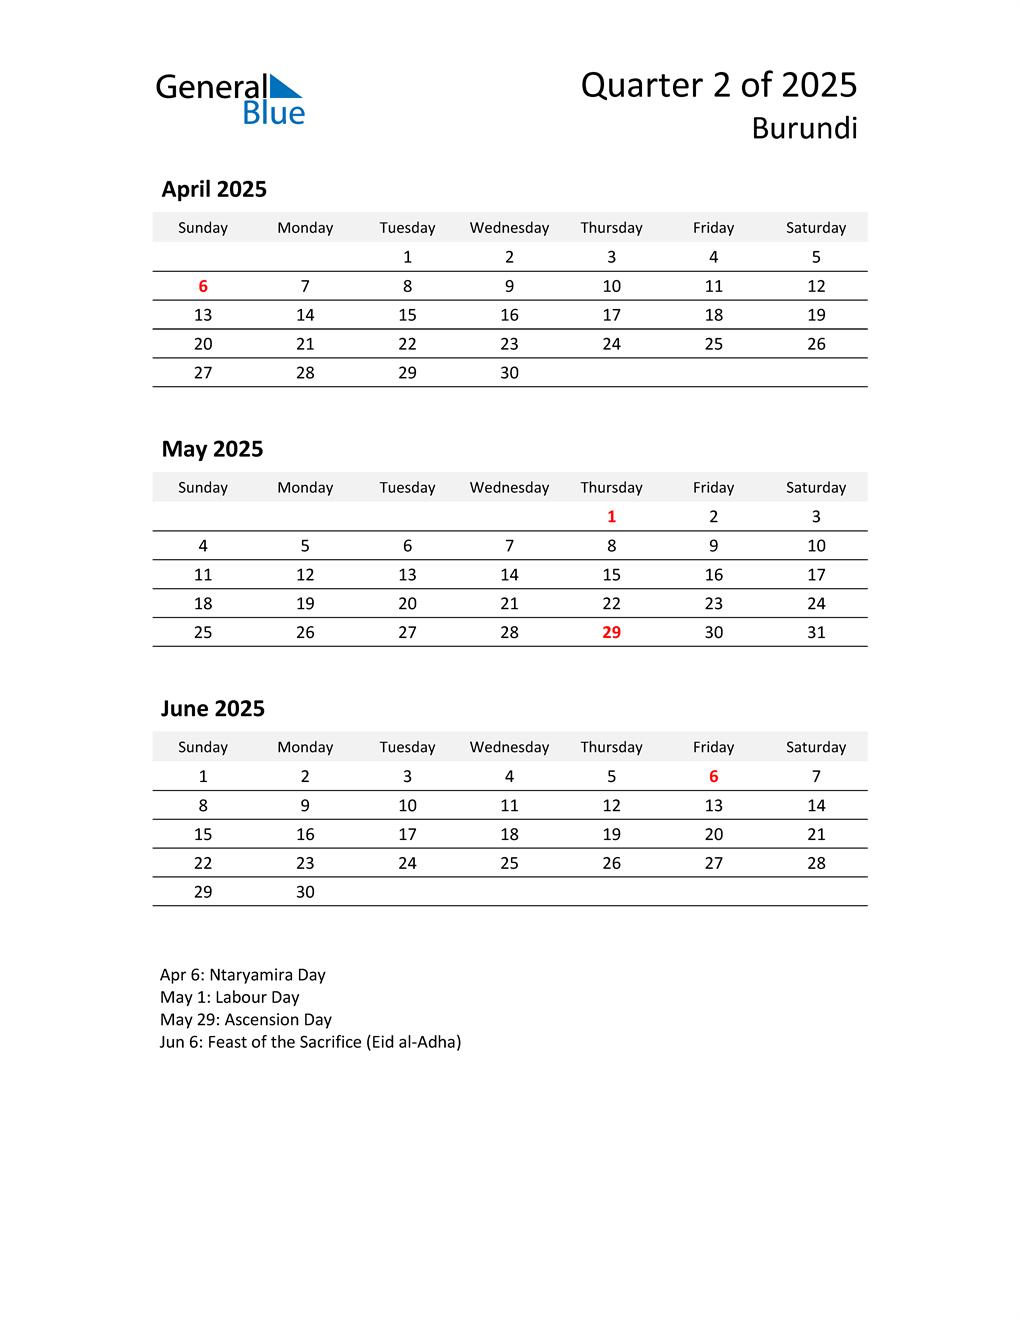 2025 Three-Month Calendar for Burundi